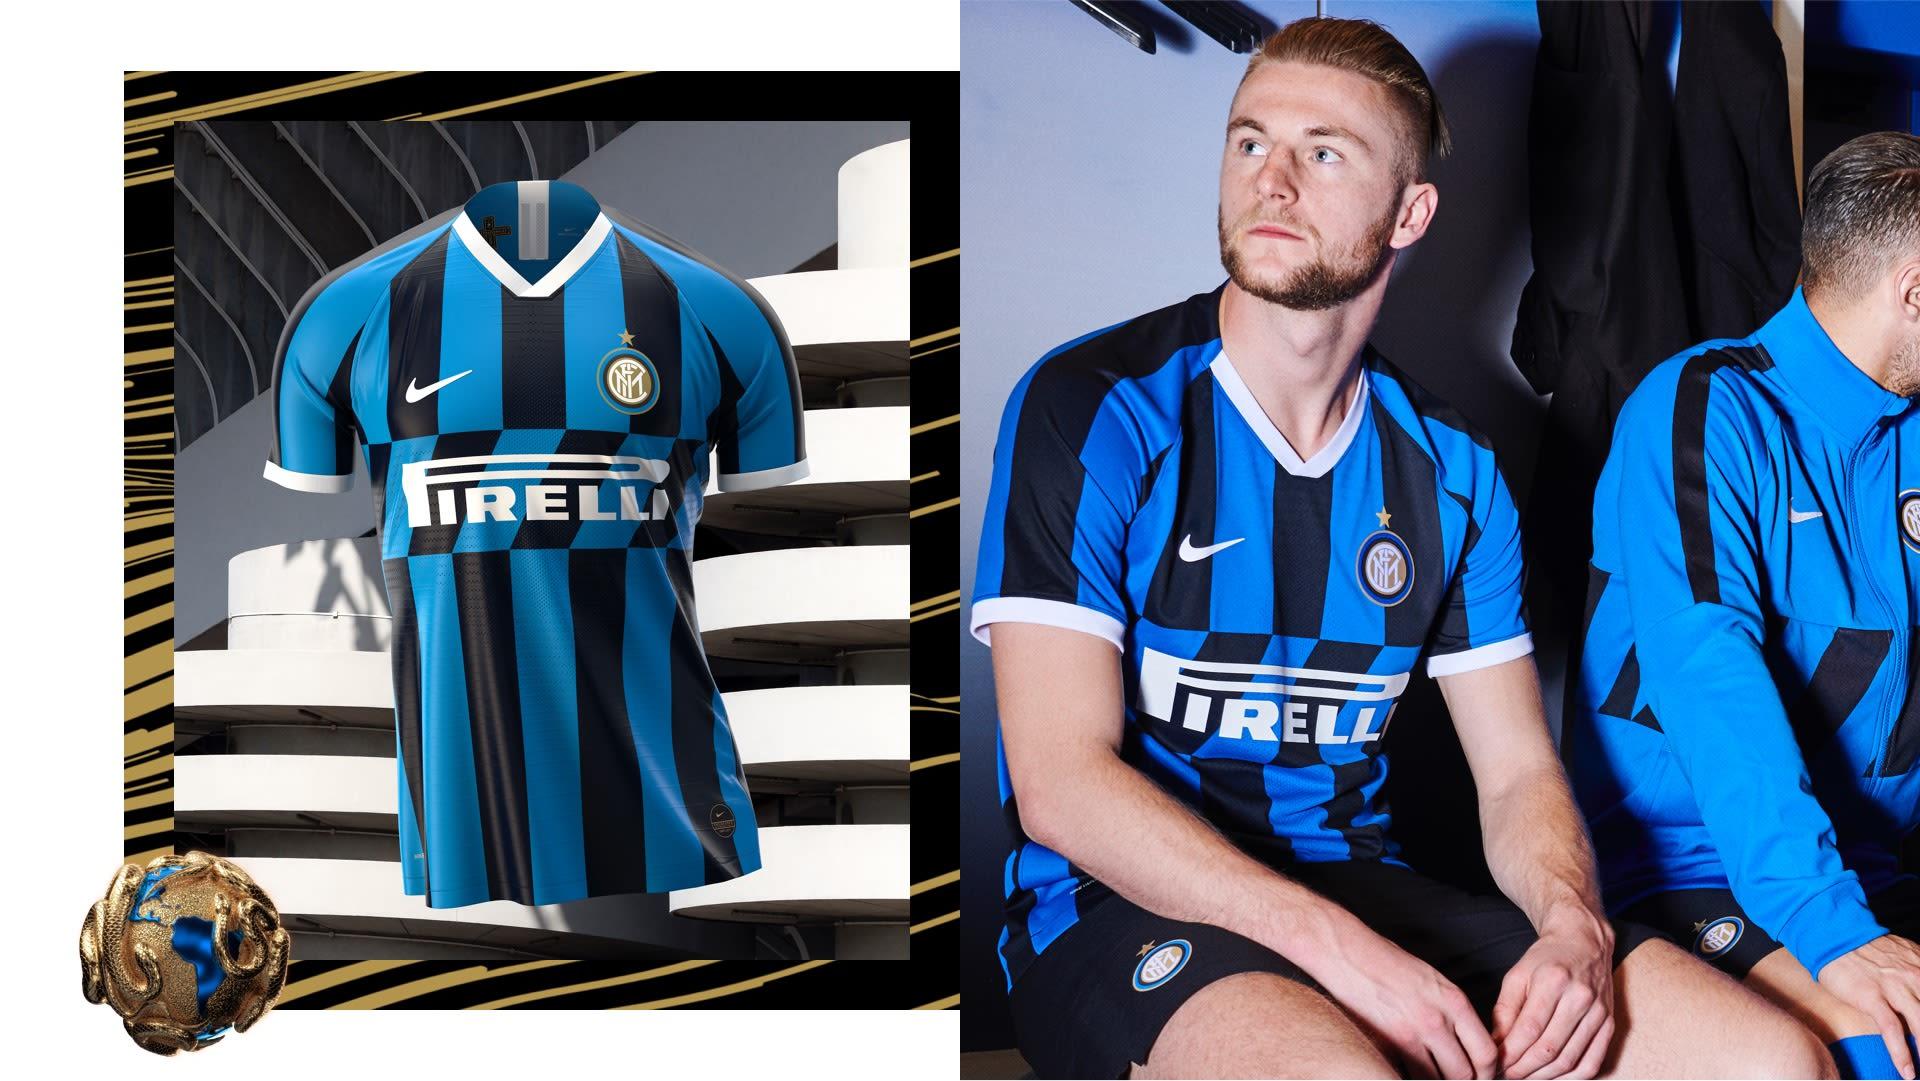 huge selection of 5c1f7 d2e02 2019/20 Inter Milan Stadium Home Jersey . Nike.com ZA